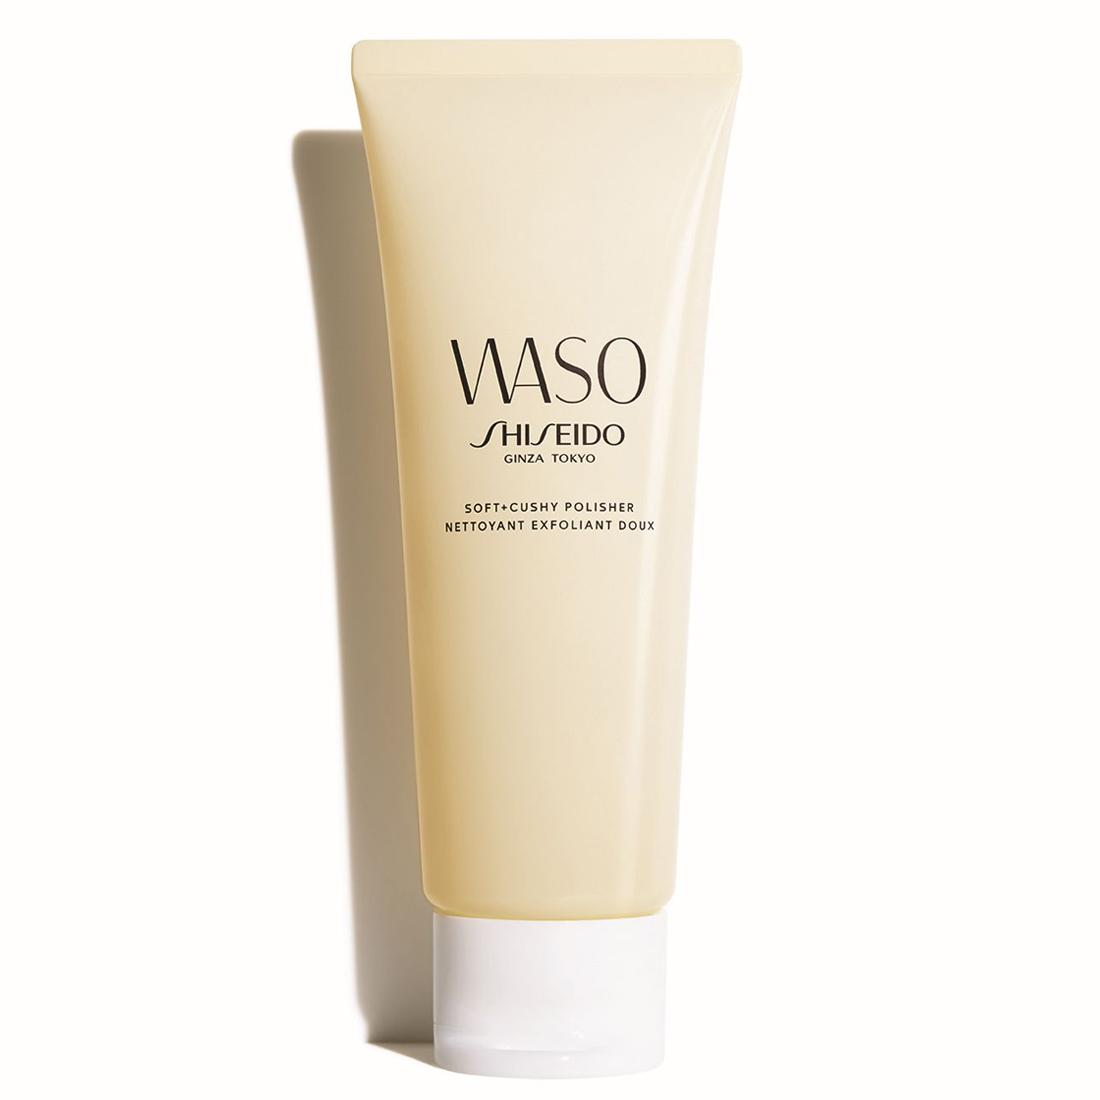 Waso Nettoyant Exfoliant Doux - Shiseido